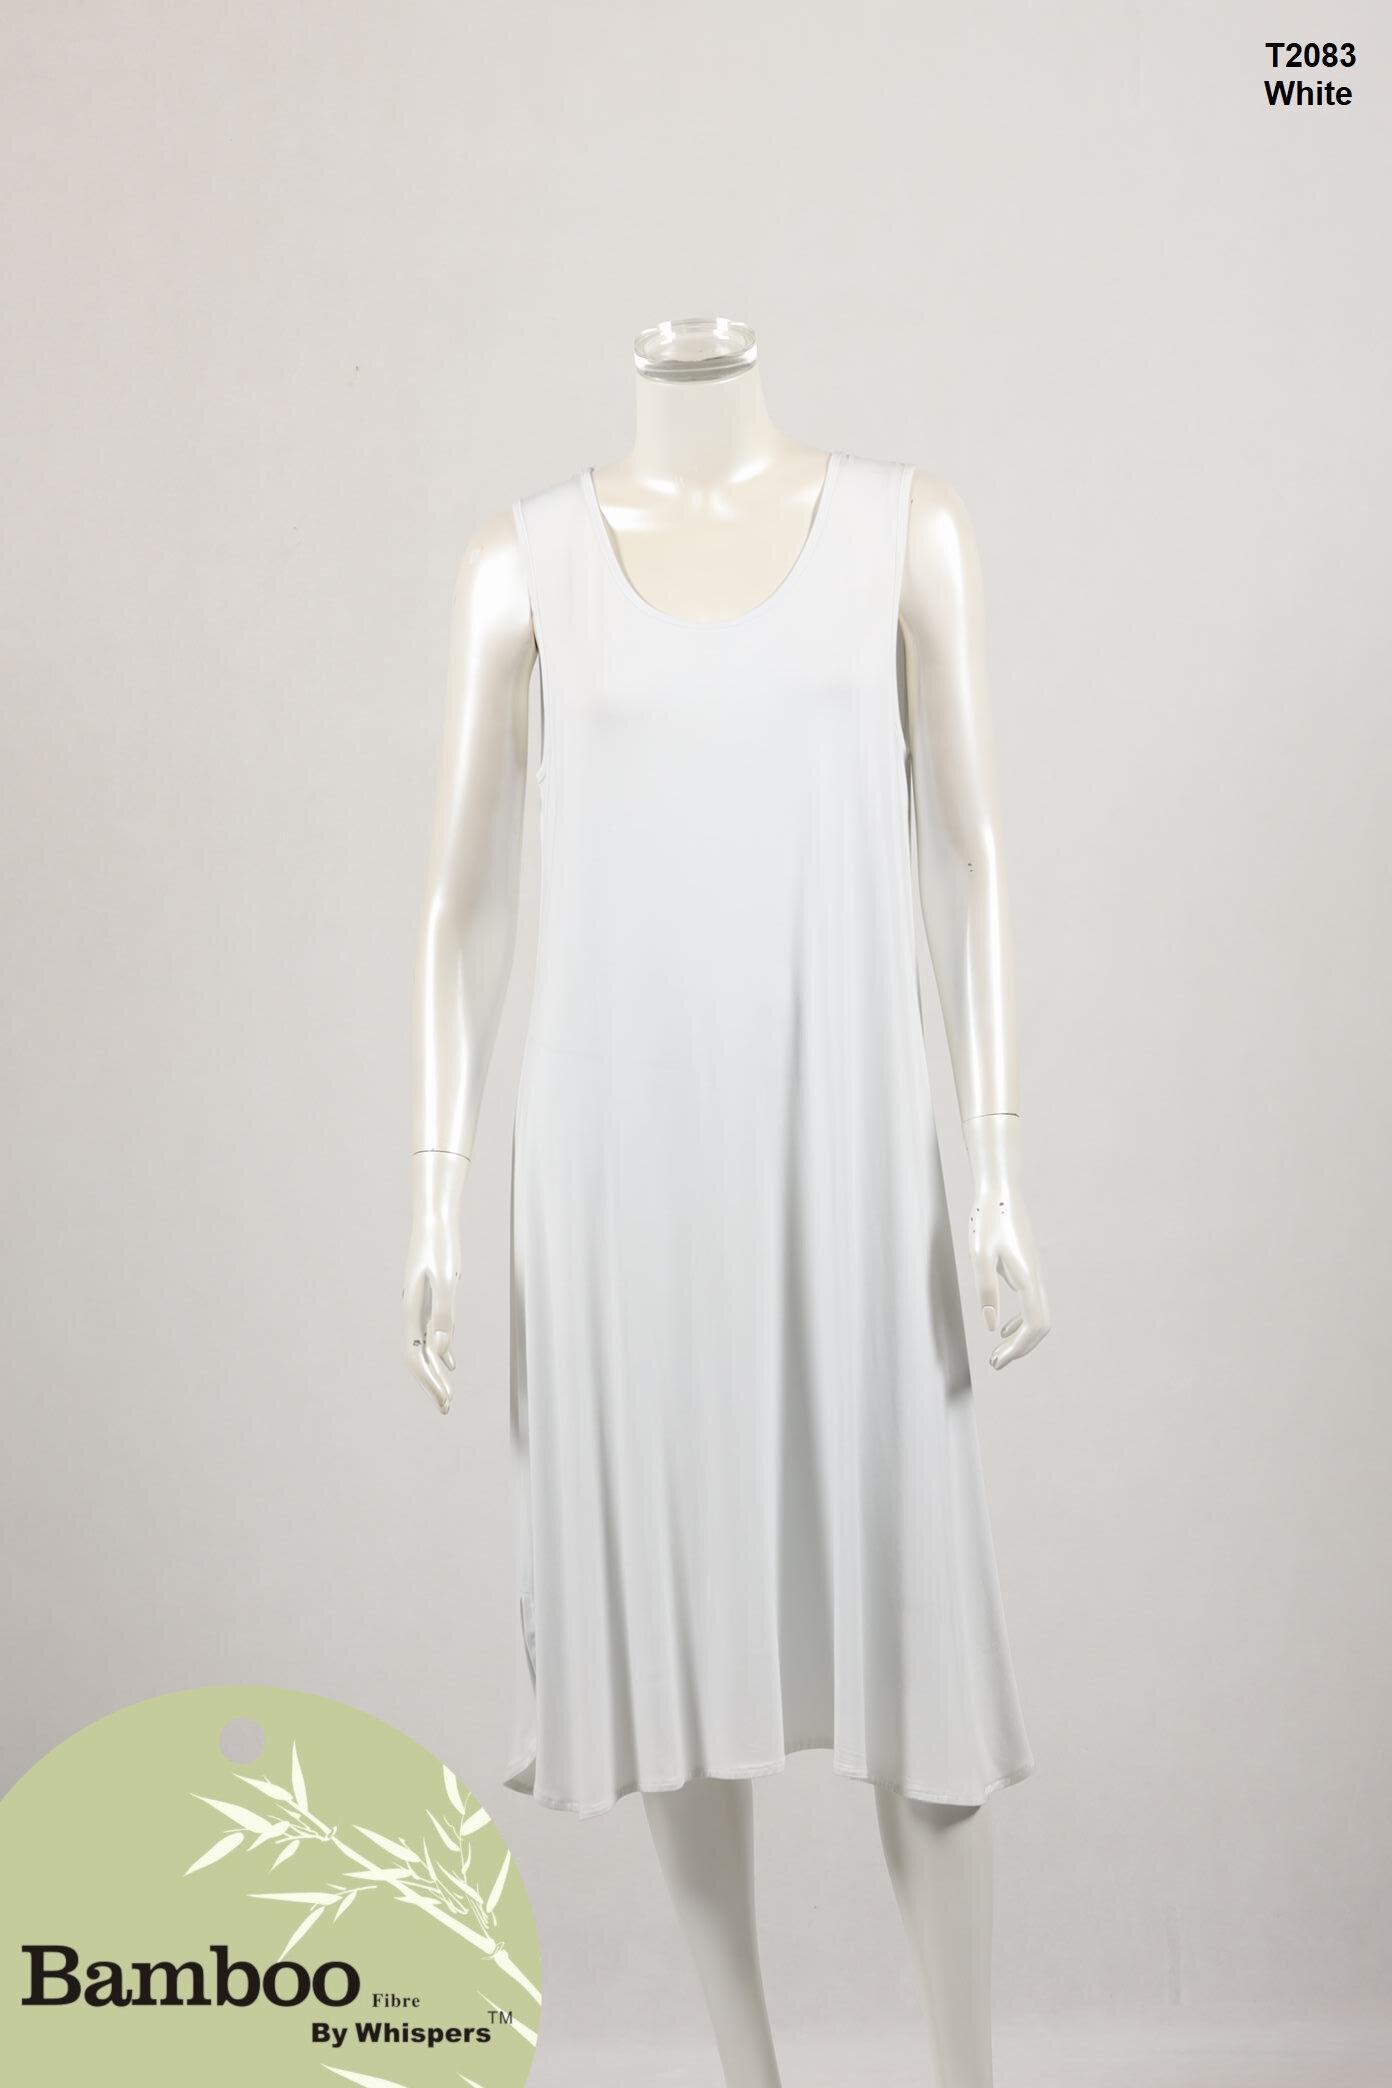 T2083-Bamboo Dress-White.JPG